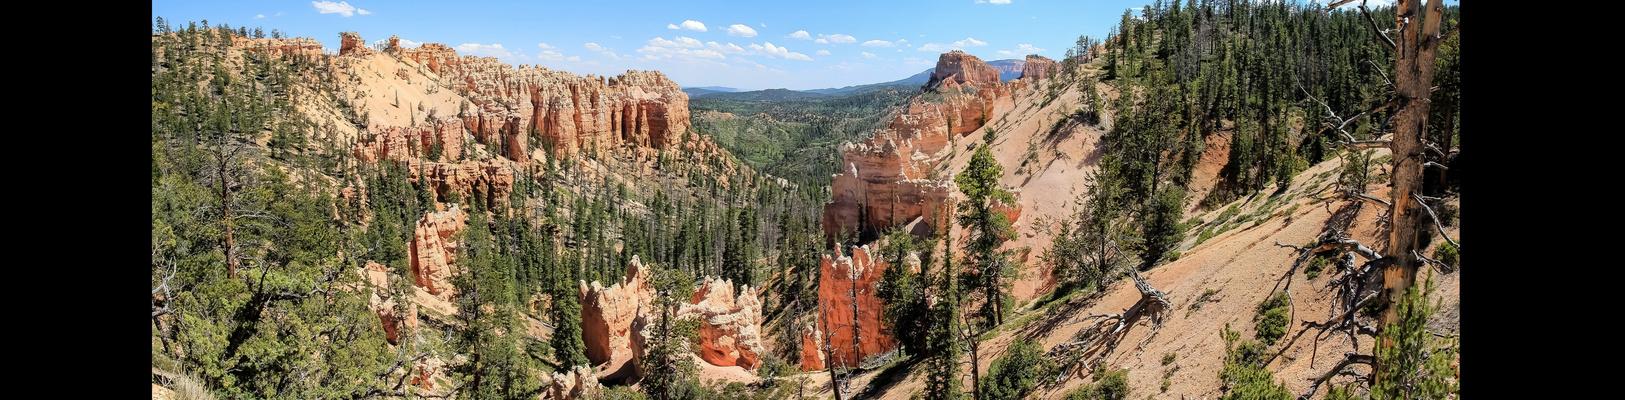 Bryce Canyon IV